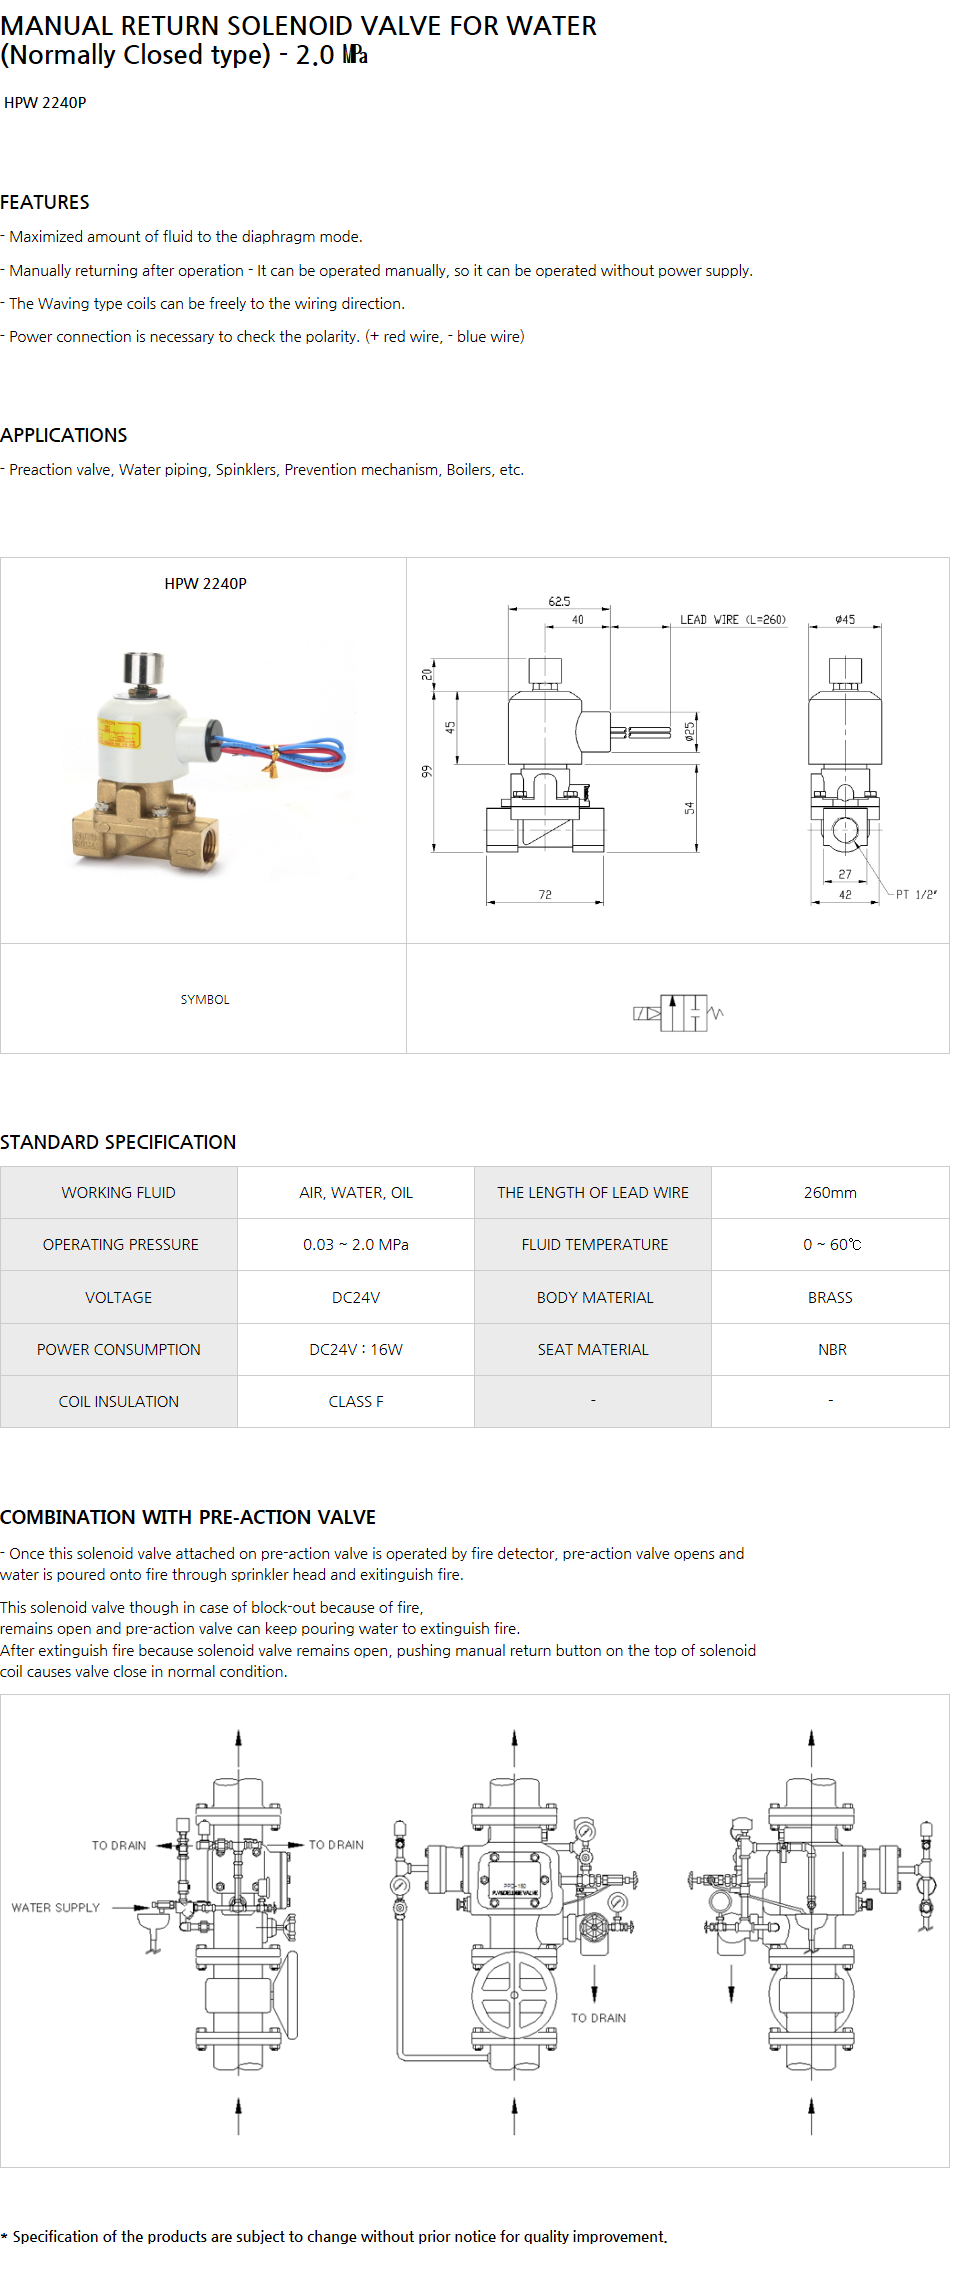 HYOSHIN MECHATRONICS Manual Return Solenoid Valve For Water (N.C) HPW 2240P